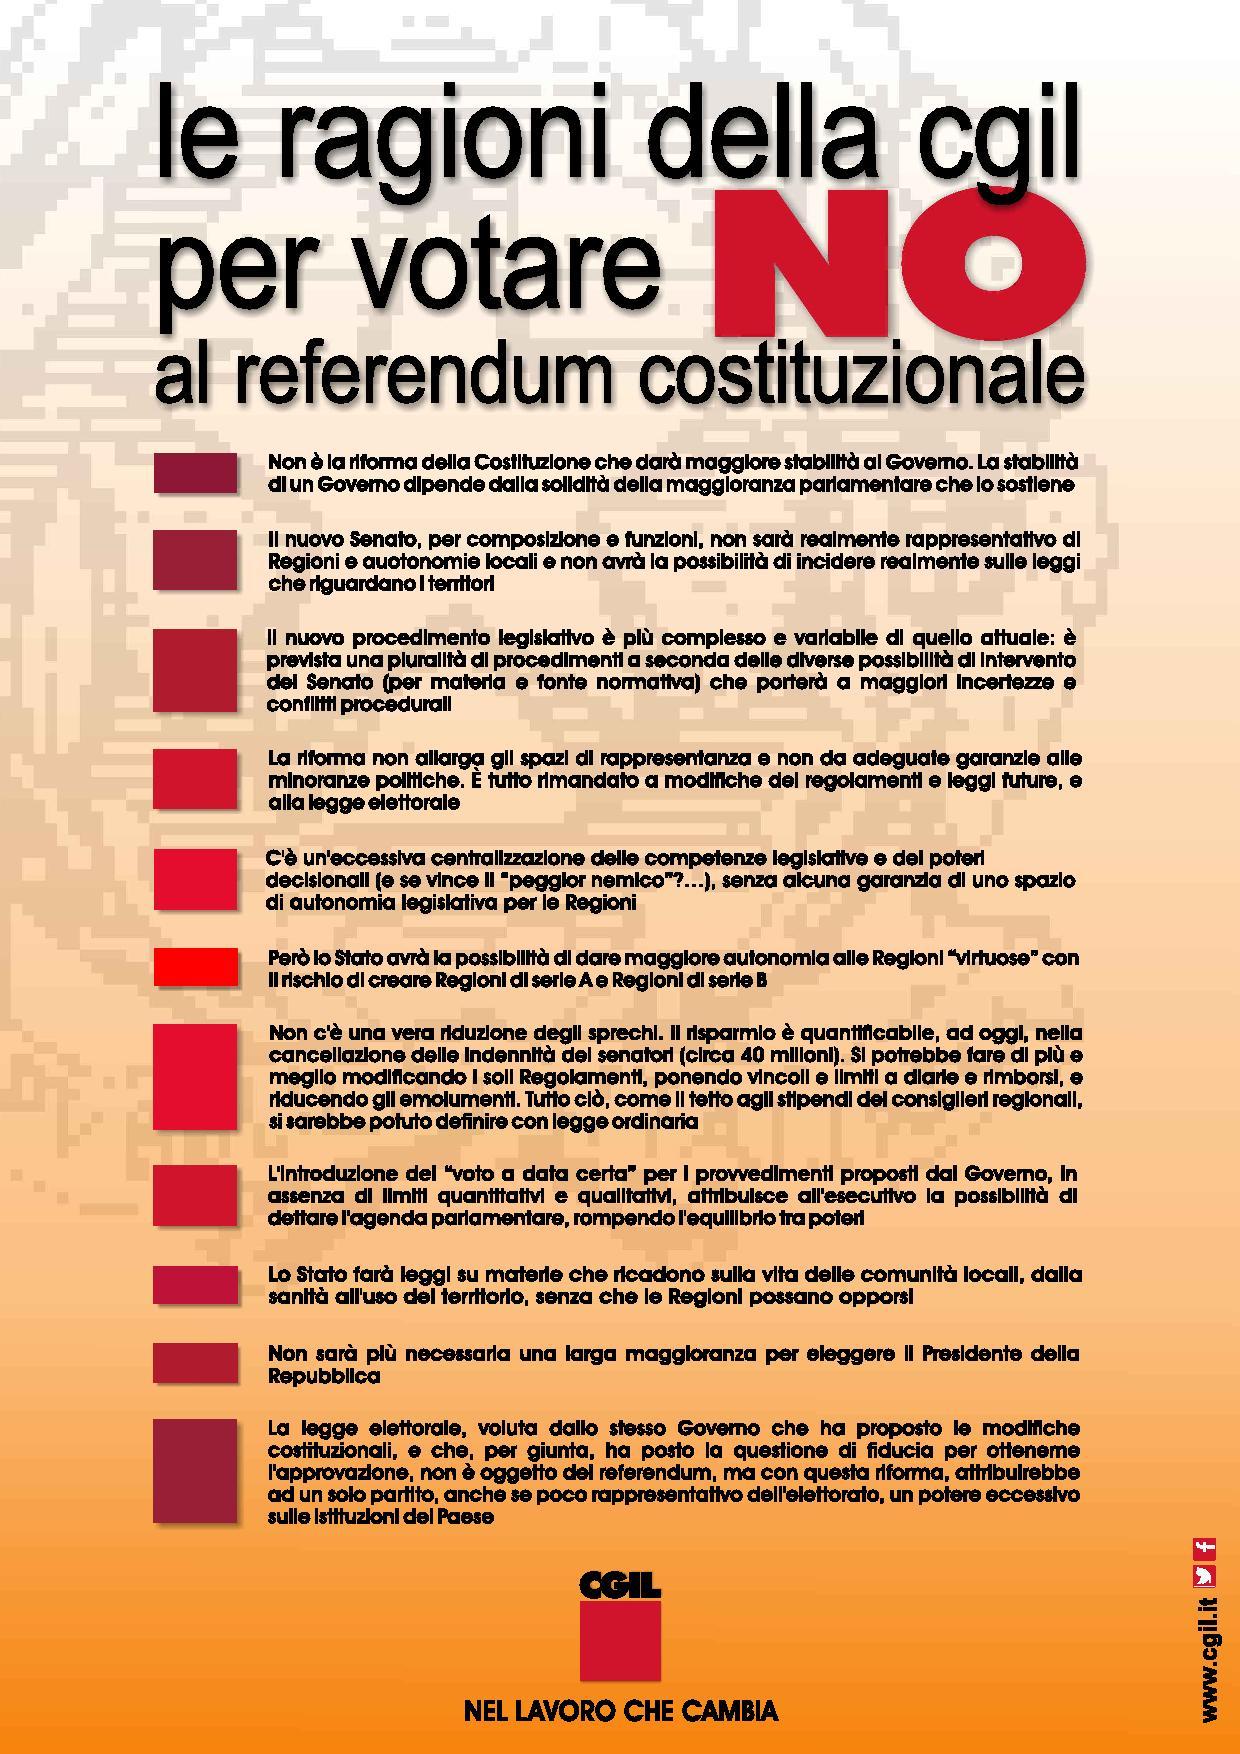 referendum costituzionale ragioni-cgil-a4-page-001